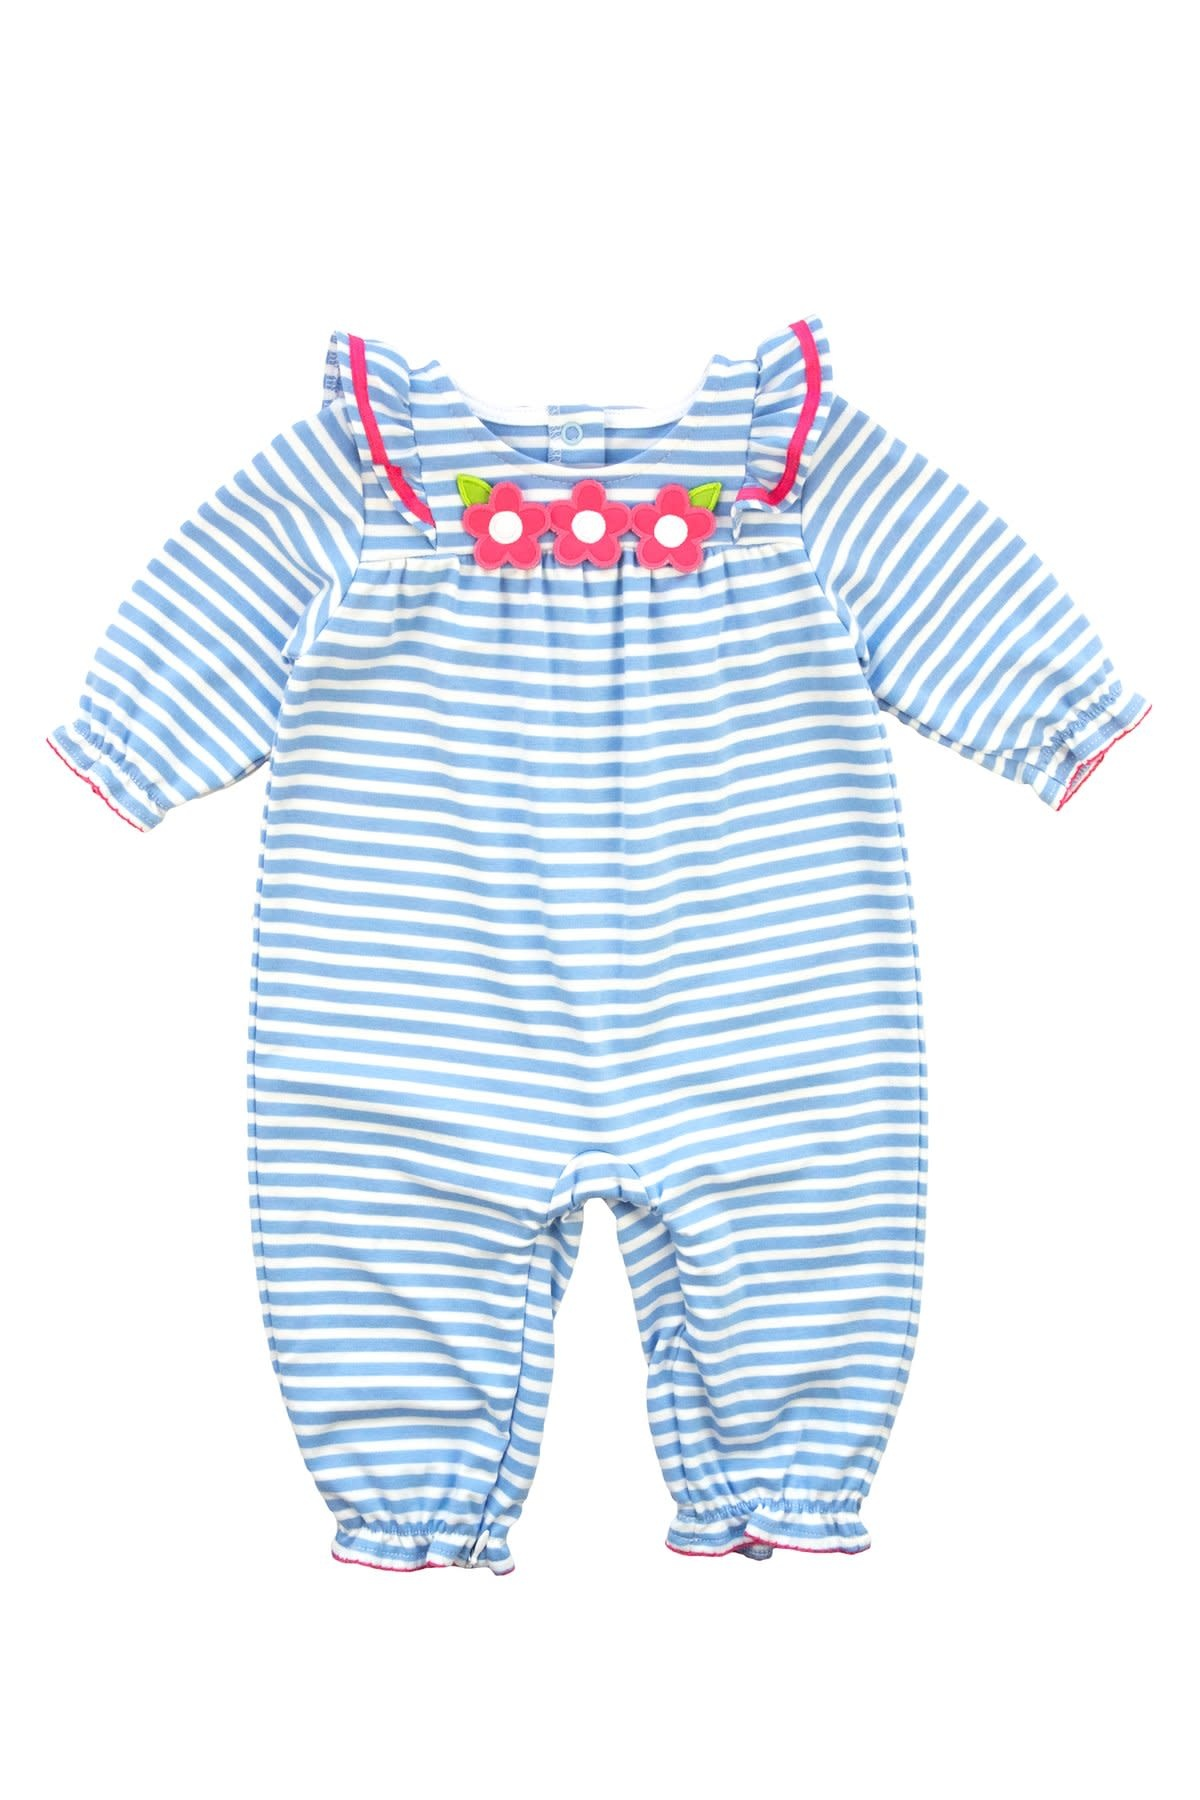 Florence Eiseman Ruffle Sleeve Blue Stripe Longall